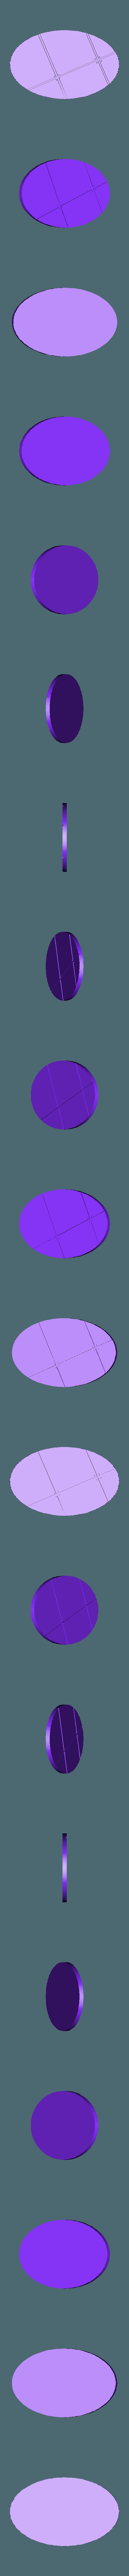 Base_XL.stl Download free STL file Imperial Crusader Mech - New Legs • 3D printable model, GarinC3D